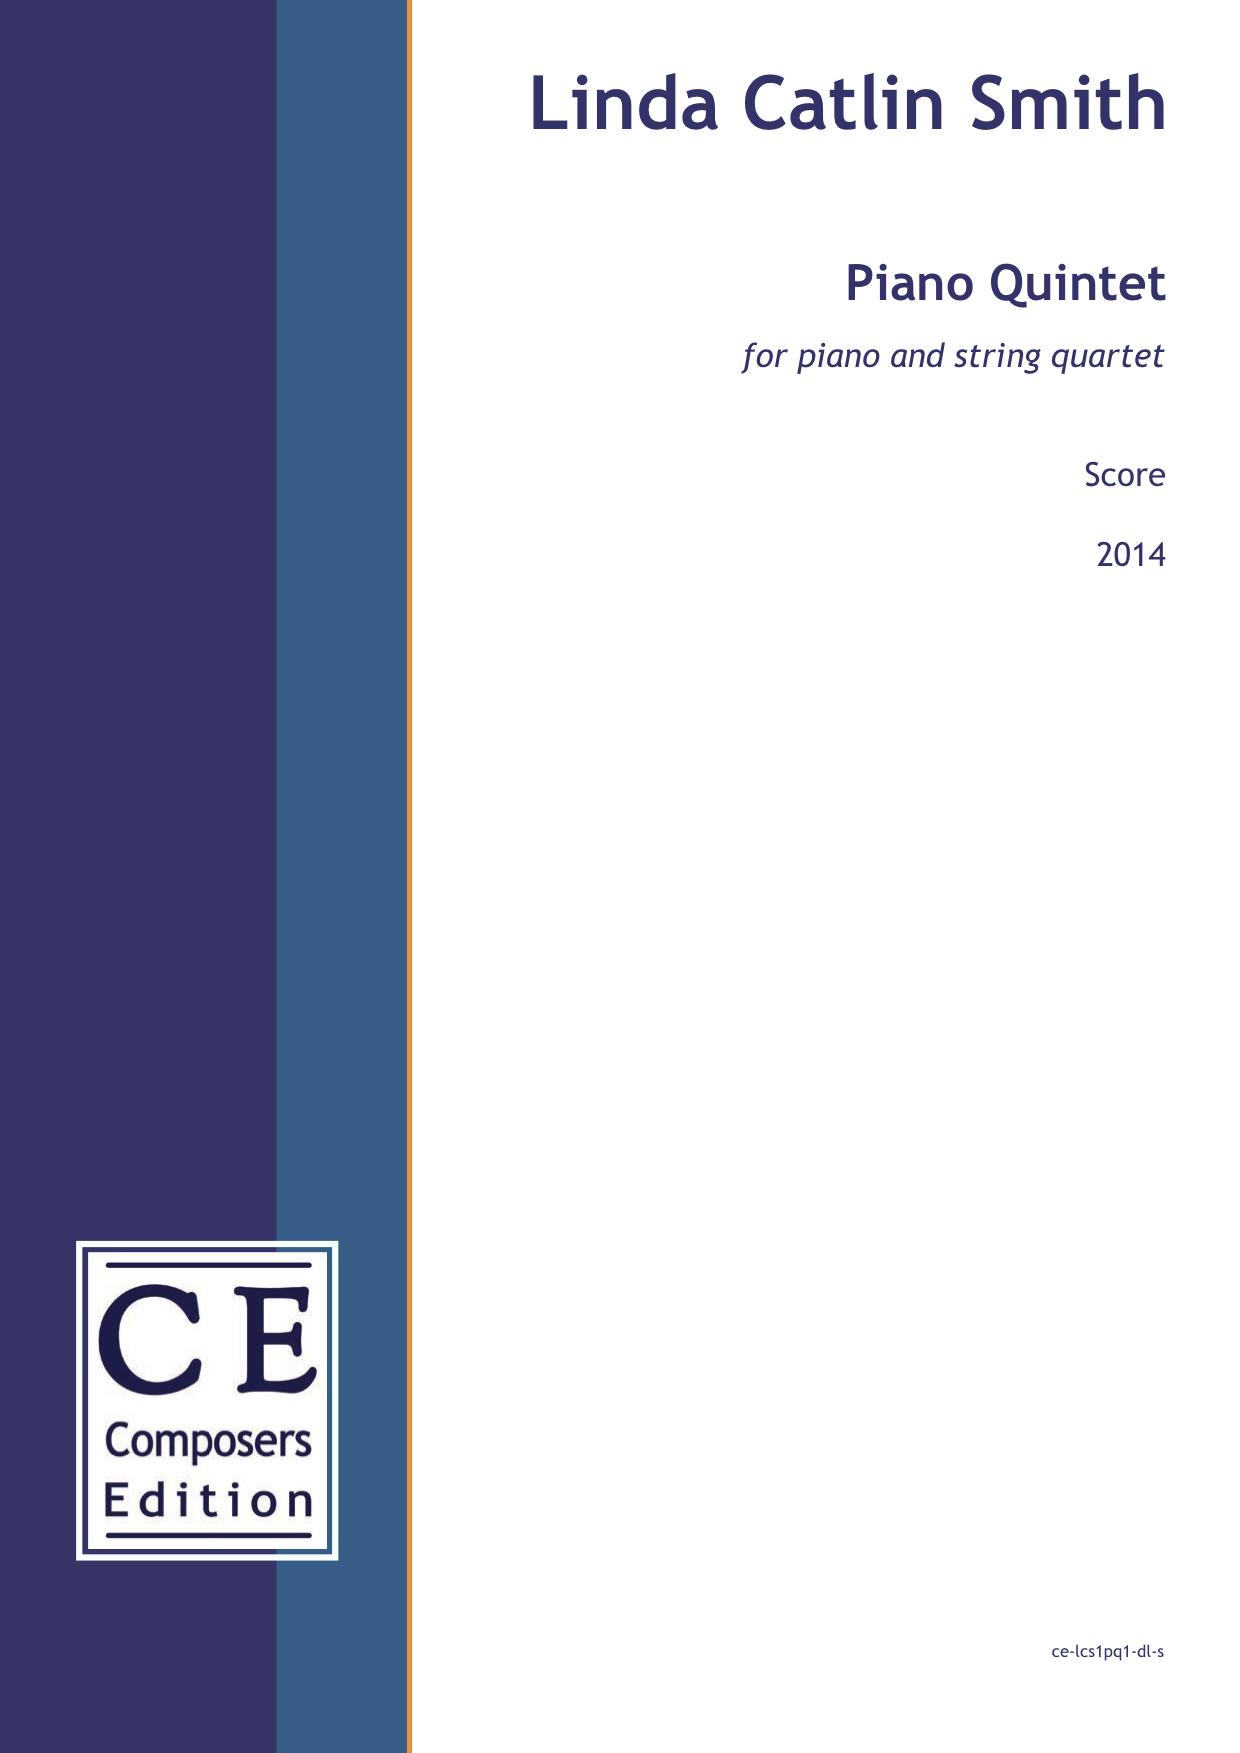 Linda Catlin Smith: Piano Quintet for piano and string quartet